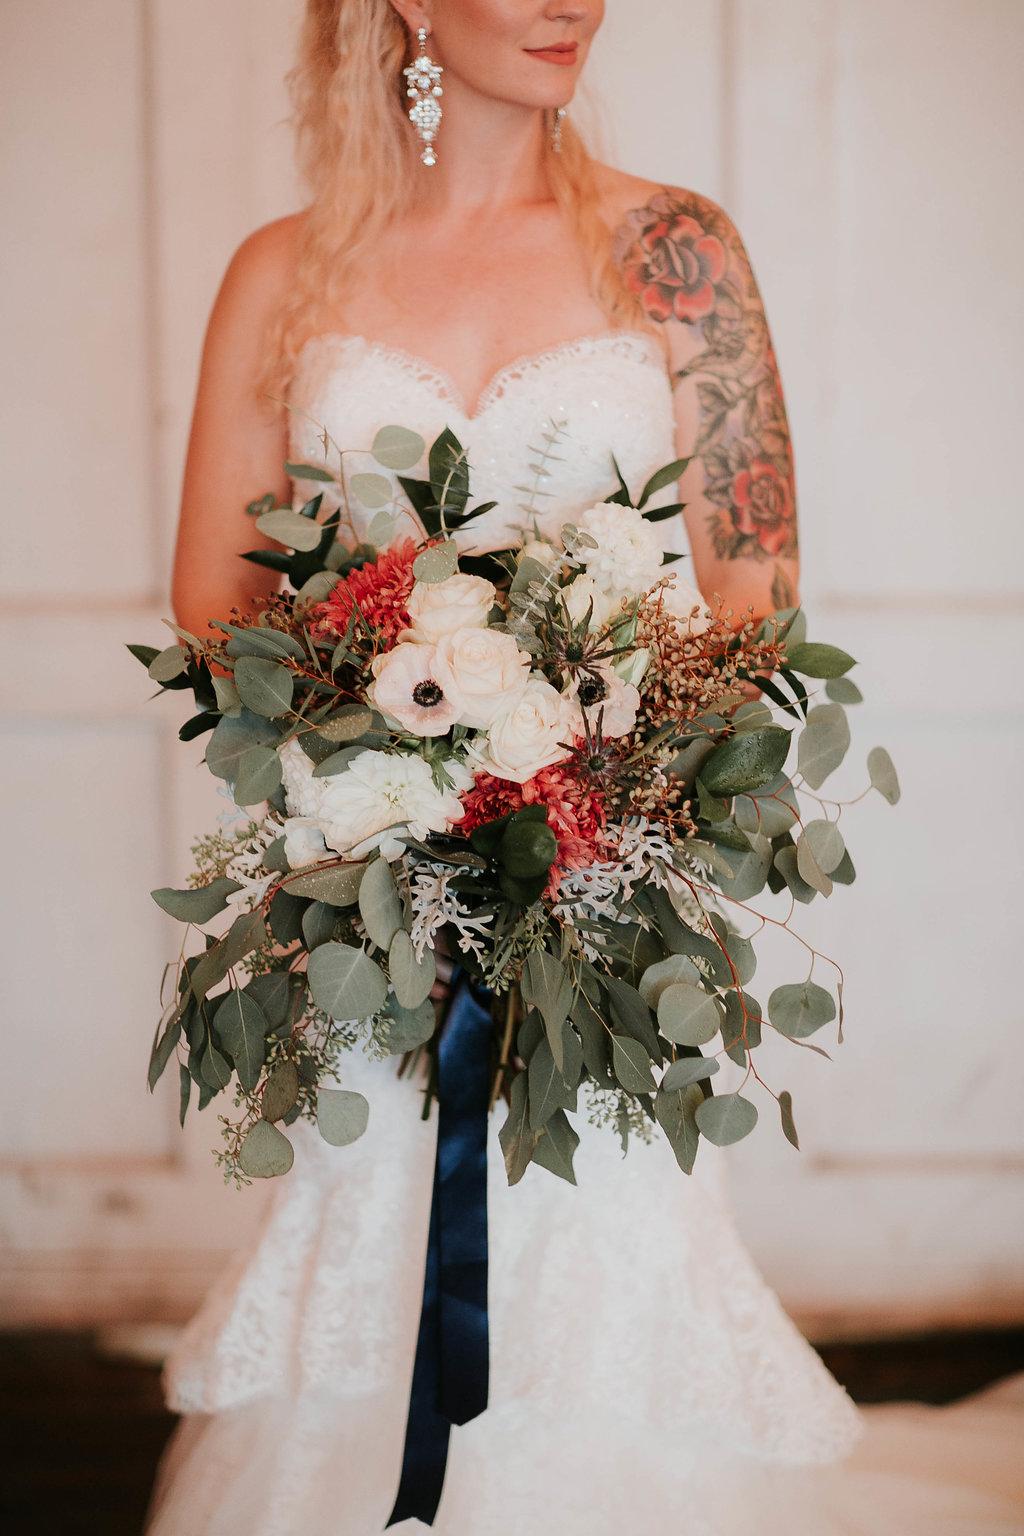 The_Big_Fake_wedding_Seattle_Within_sodo_wedding_by_Adina_Preston_Weddings_147.JPG